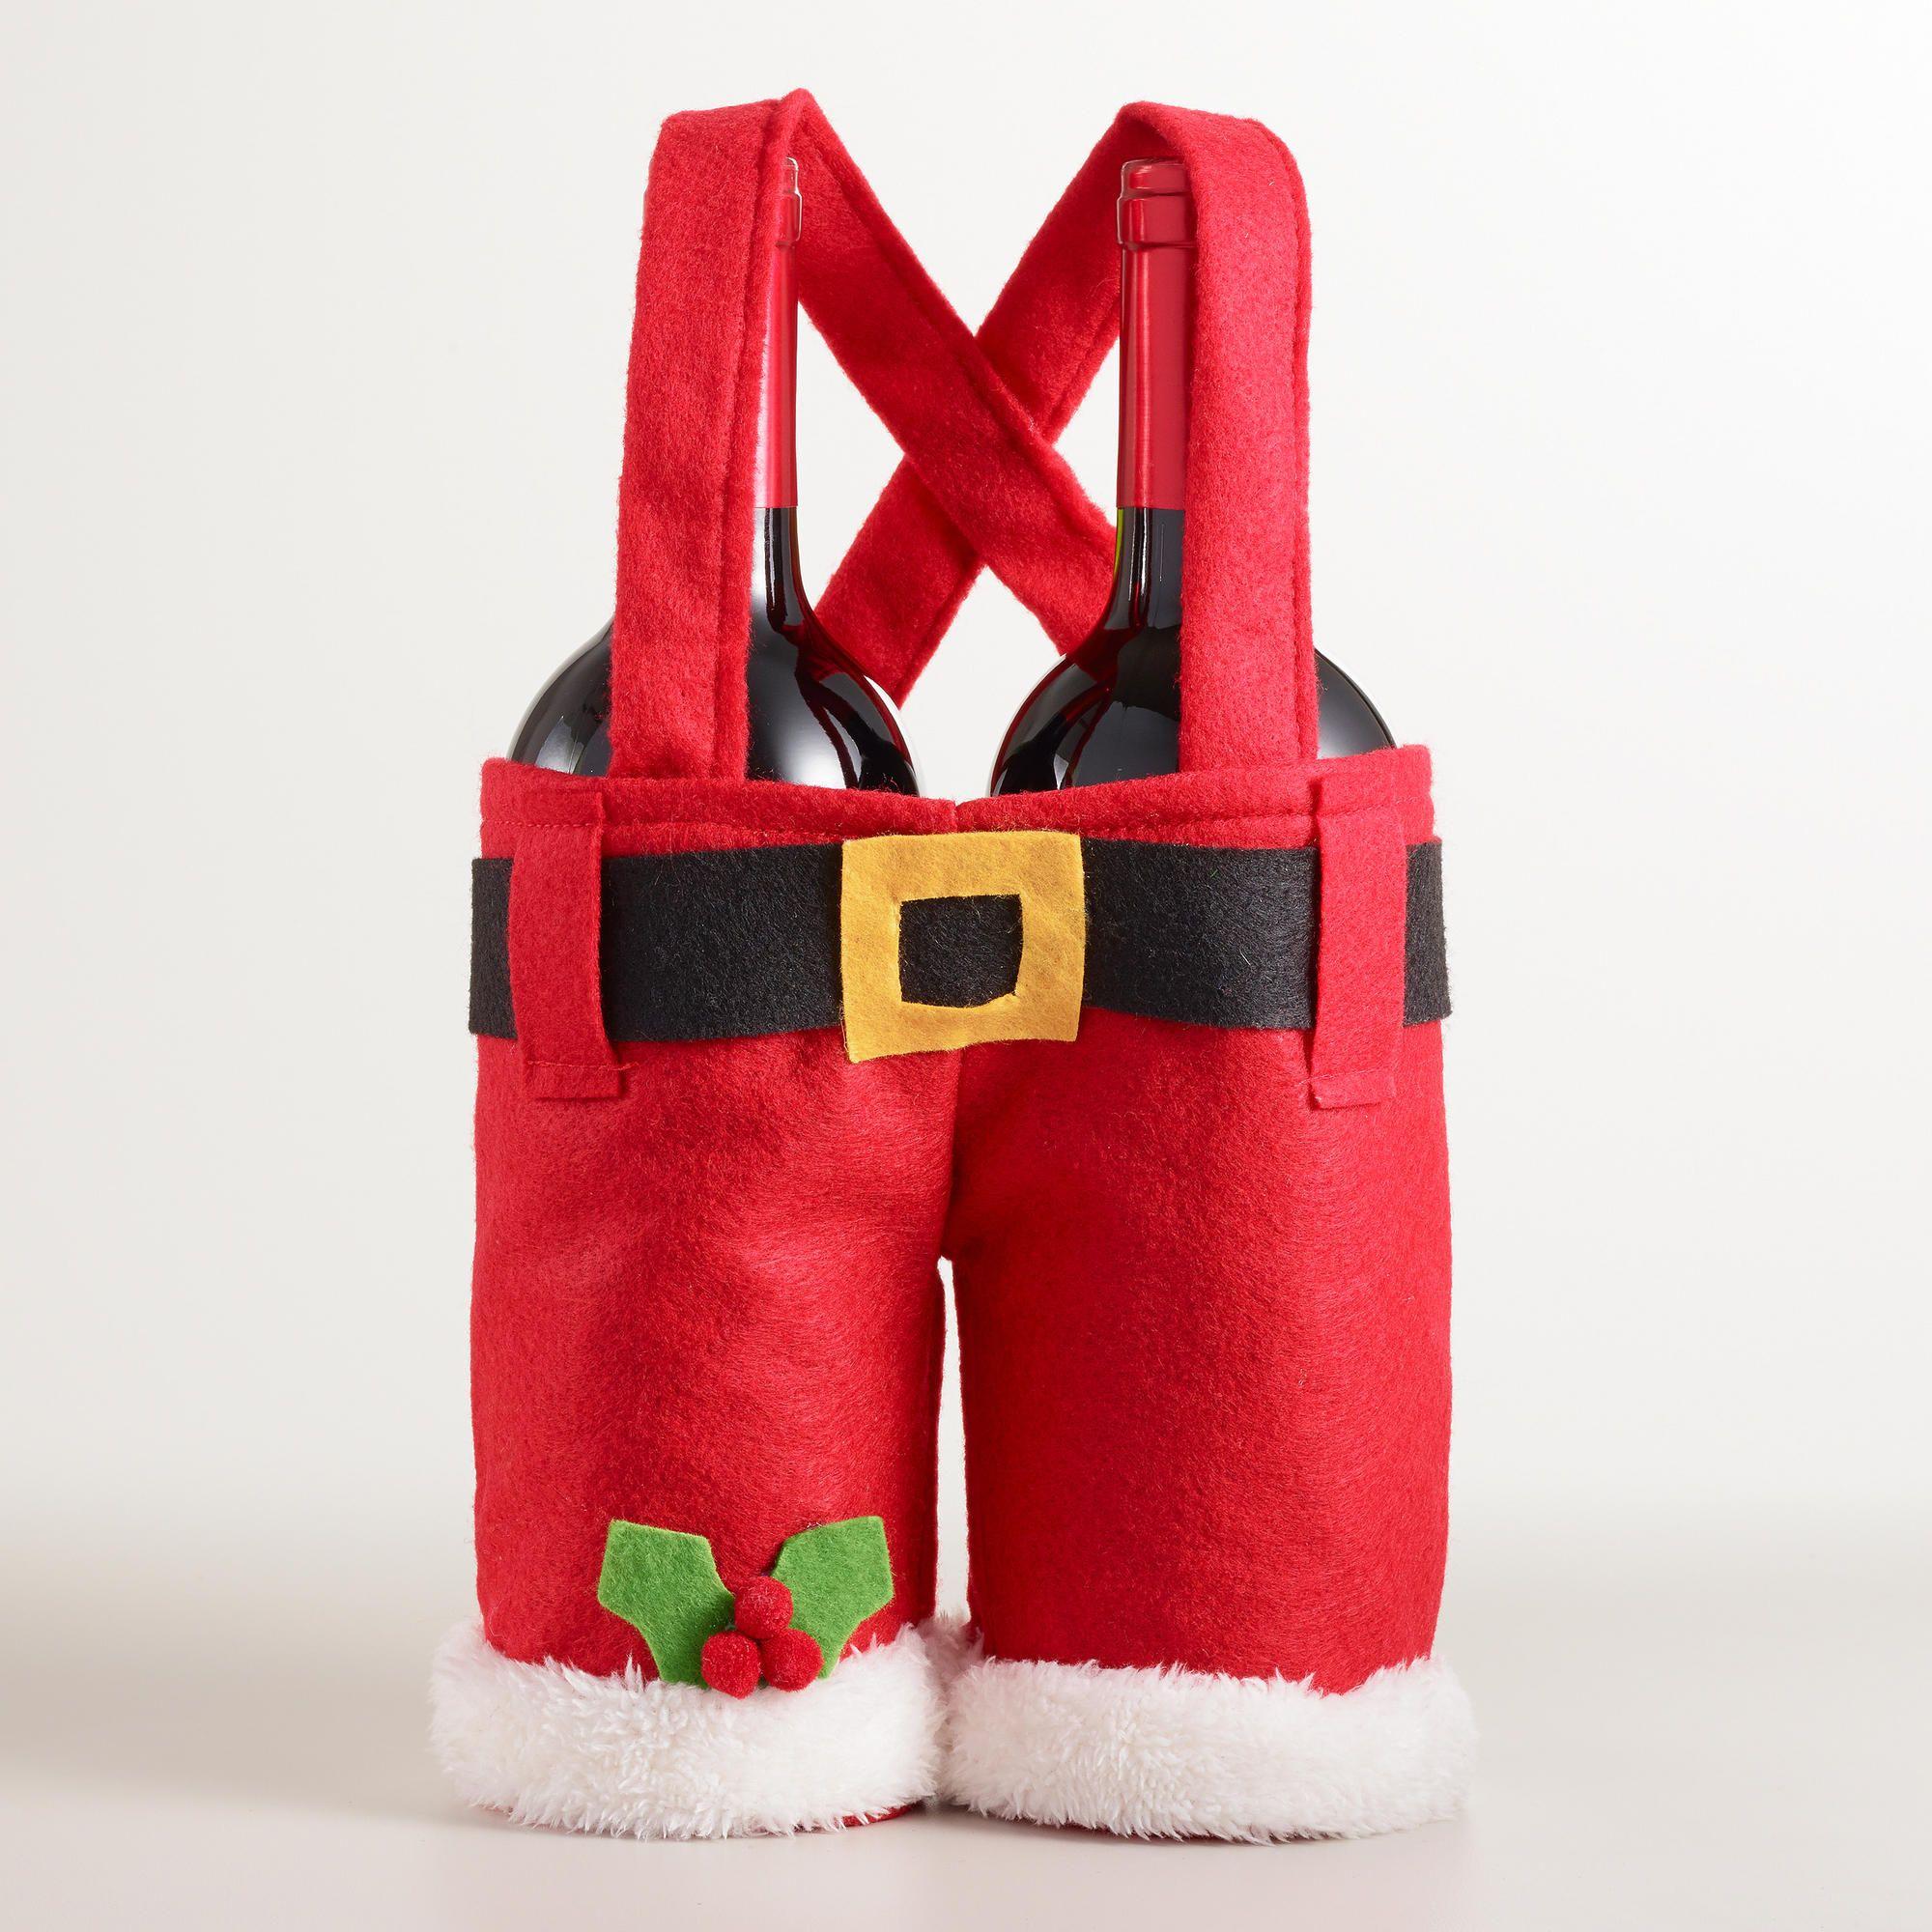 Santa Pants Double Wine Carrier Holiday Entertaining Christmas Christmas Fun Christmas Love